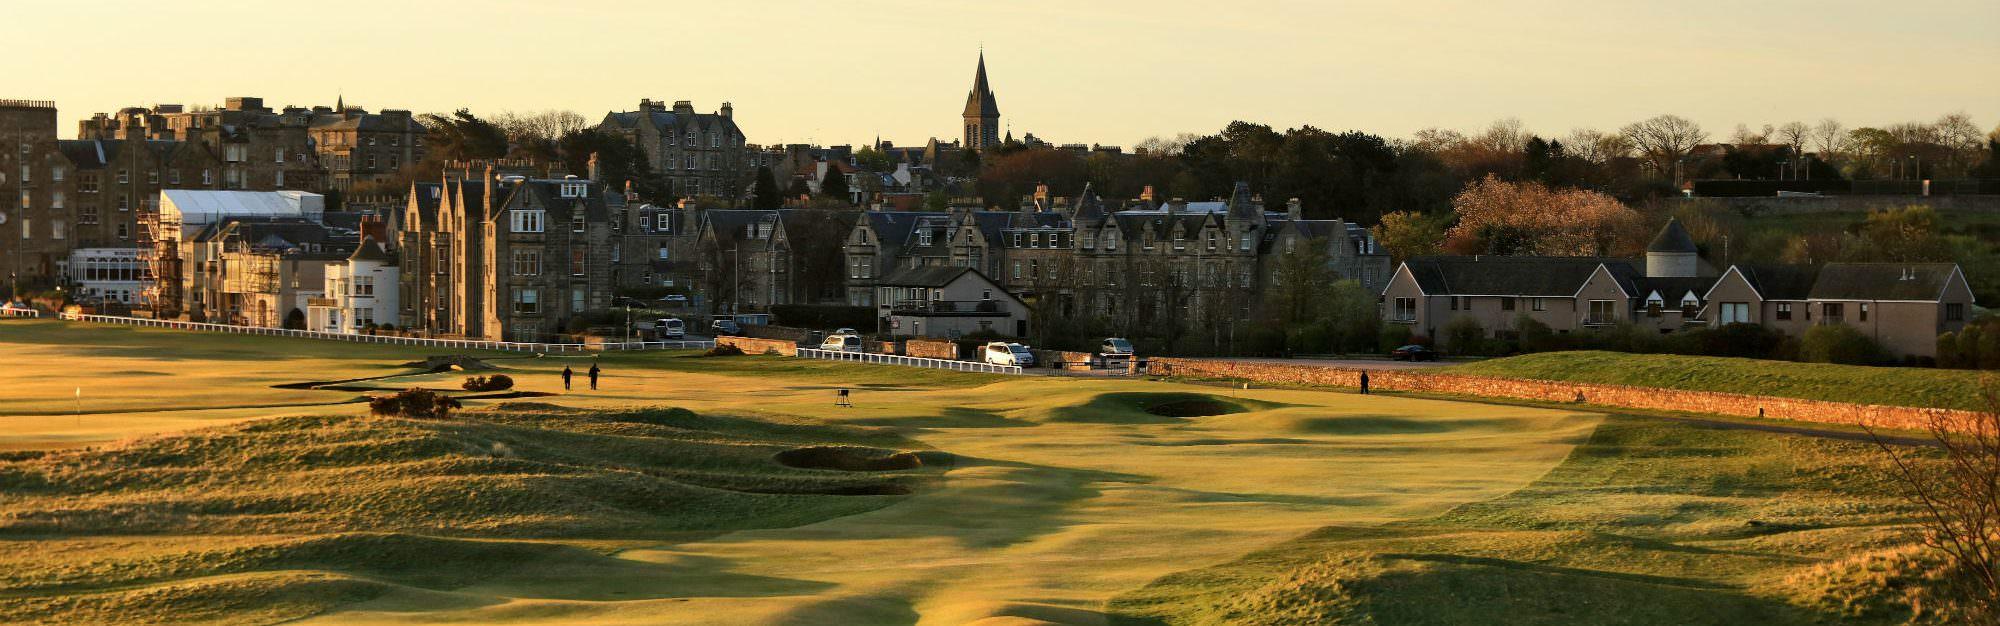 The return of golf's best ever golf video game just got even better